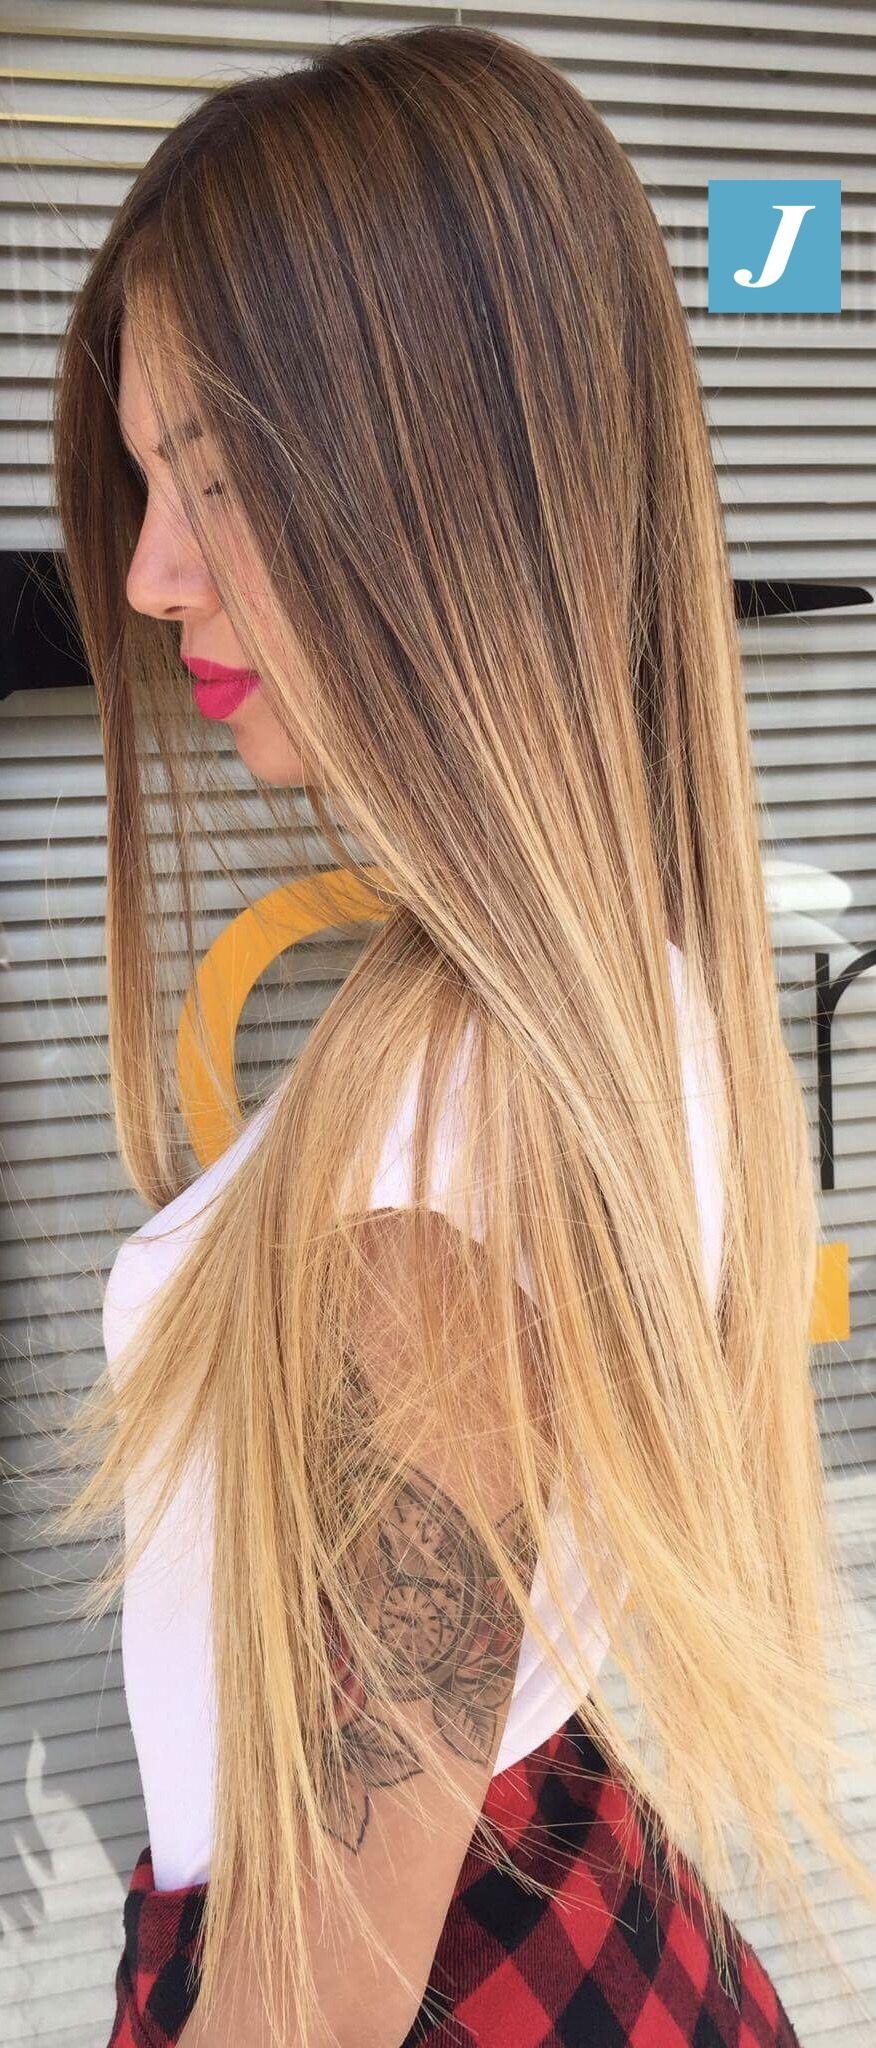 Shine bright _ Degradé Joelle #cdj #degradejoelle #tagliopuntearia #degradé #igers #musthave #hair #hairstyle #haircolour #longhair #ootd #hairfashion #madeinitaly #wellastudionyc